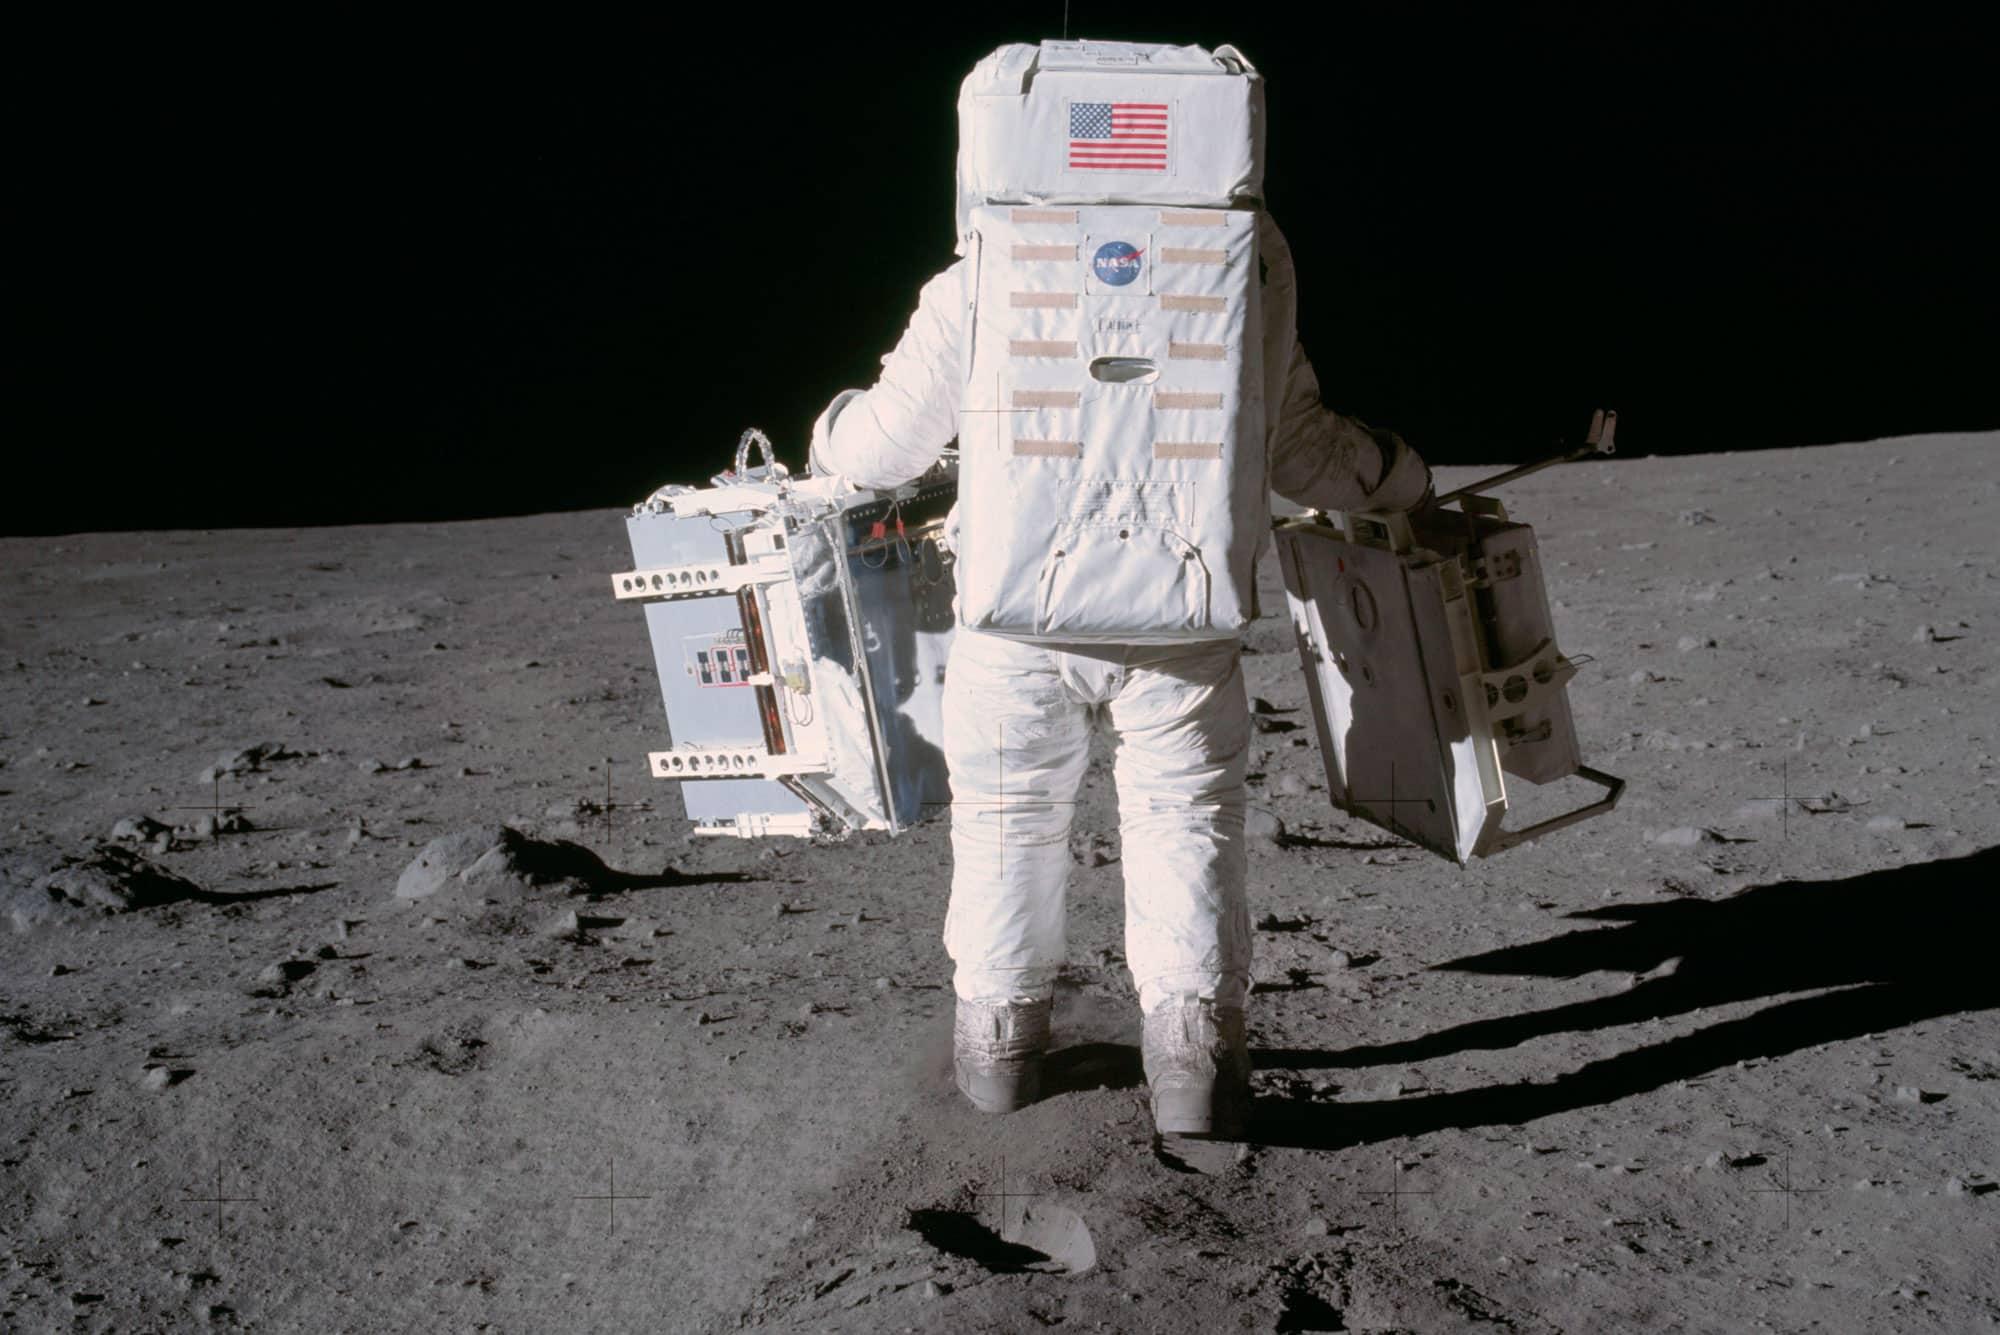 Buzz Aldrin fotografiado por Neil Armstrong en la superficie lunar